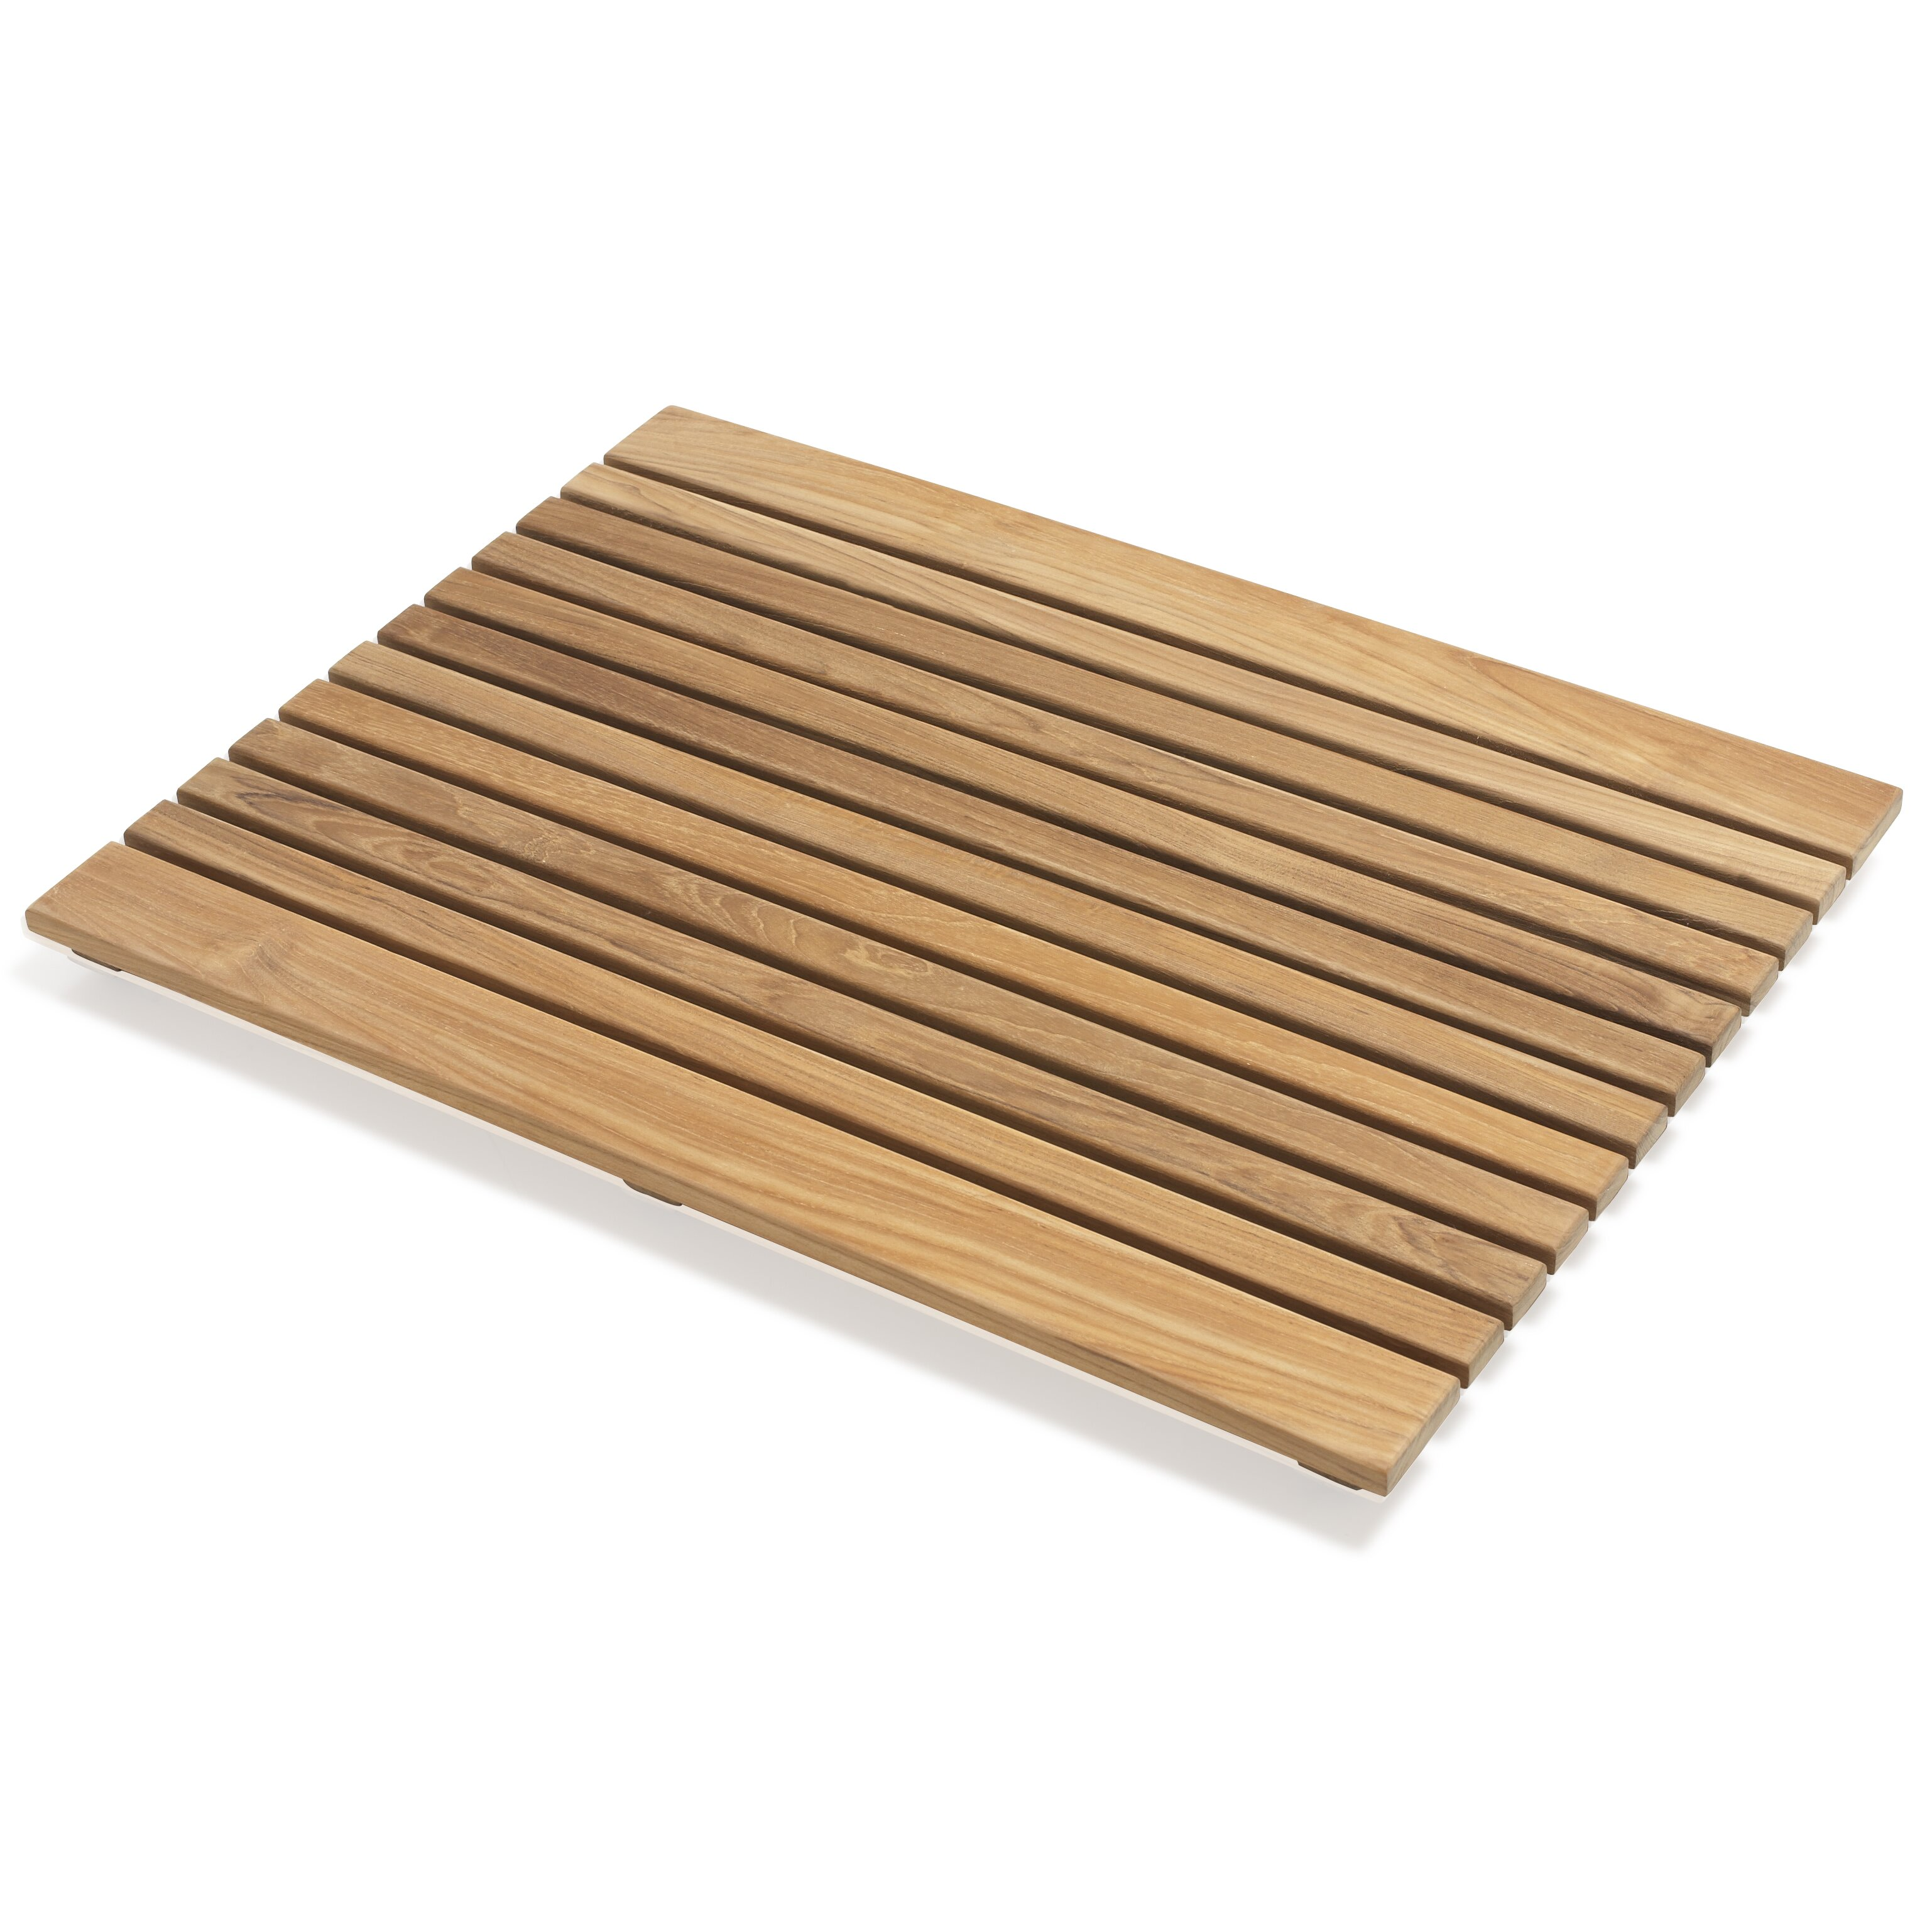 infinita corporation le spa rectangle teak shower mat. Black Bedroom Furniture Sets. Home Design Ideas